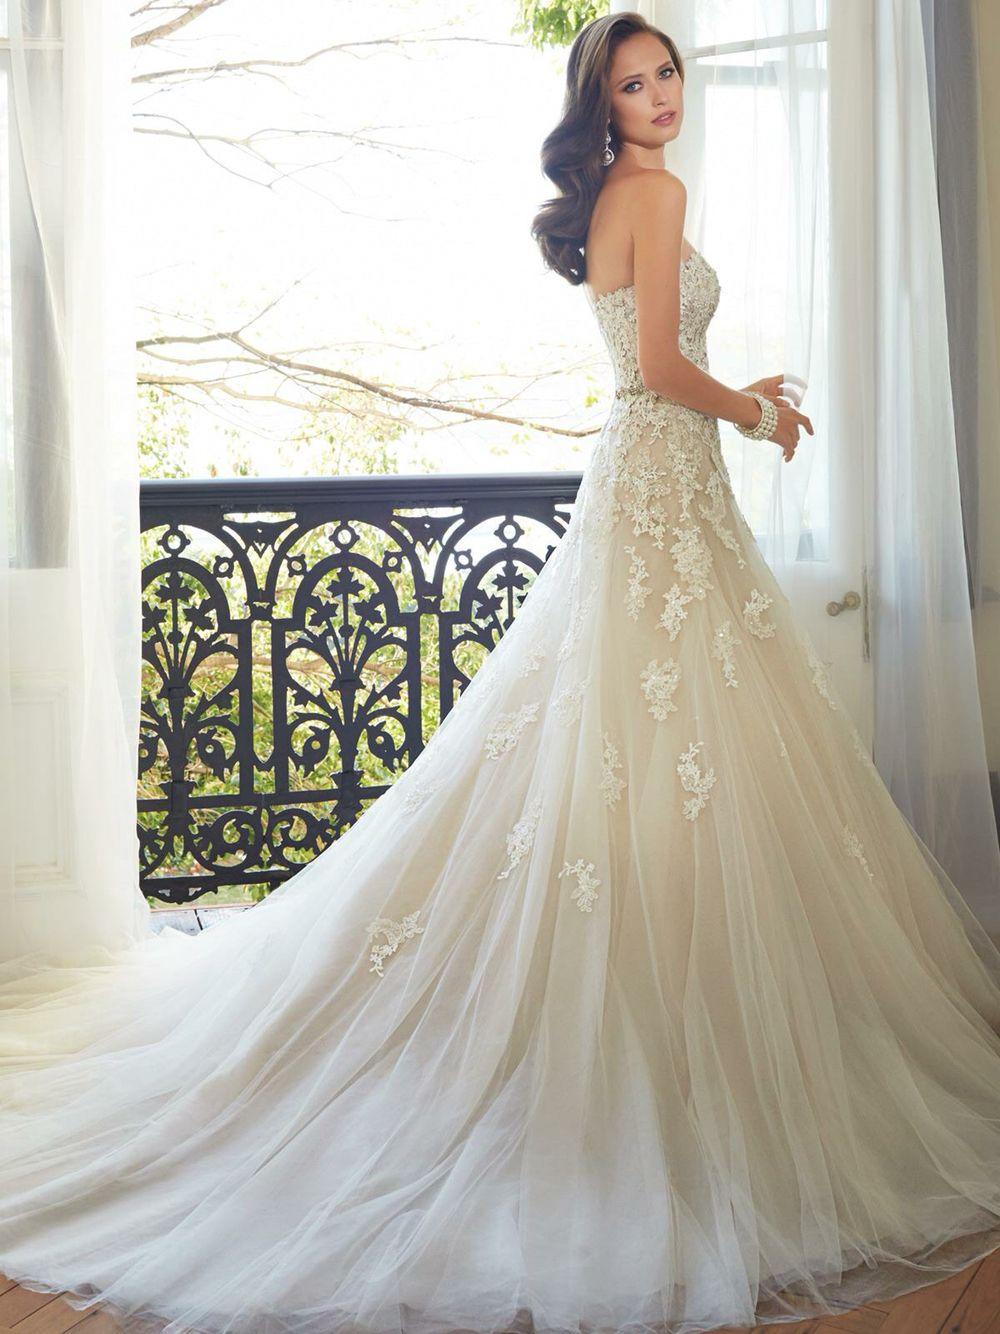 Gorgeous sophie tolli wedding gown back view wedding pinterest